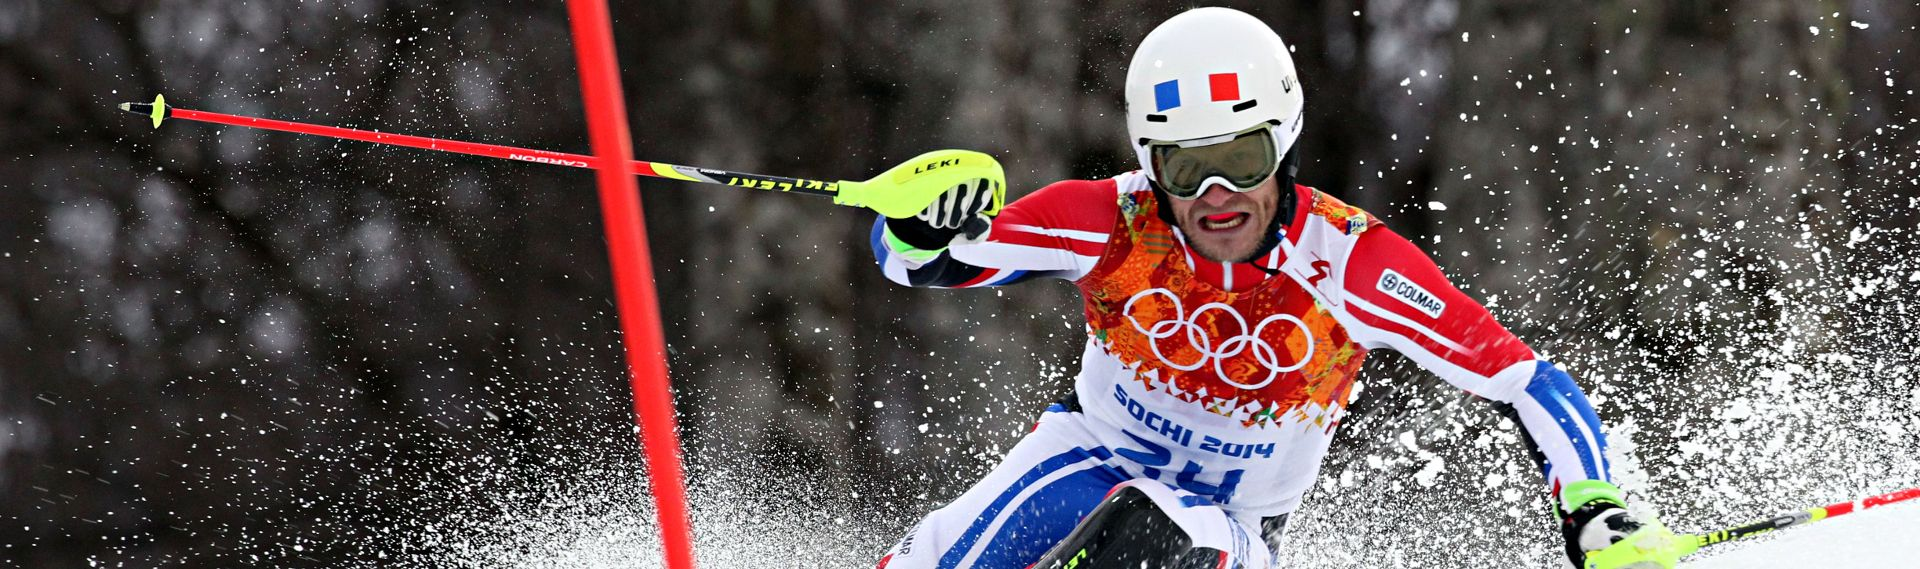 Julien Lizeroux, skieur pro, ambassadeur Kazaden